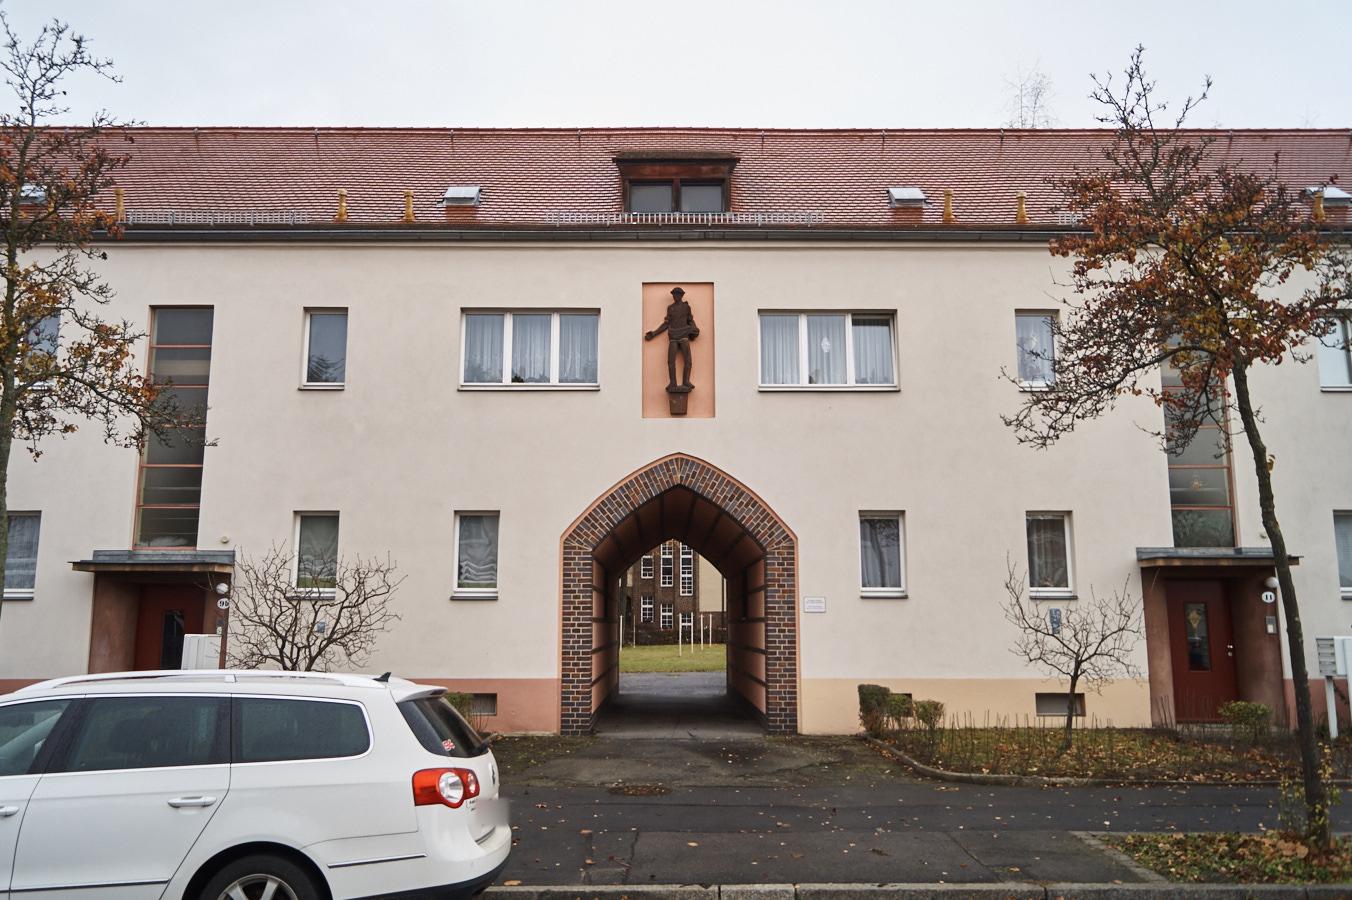 Wachwitz – Elbnahe Lage am Dresdner Fernsehturm   So lebt Dresden